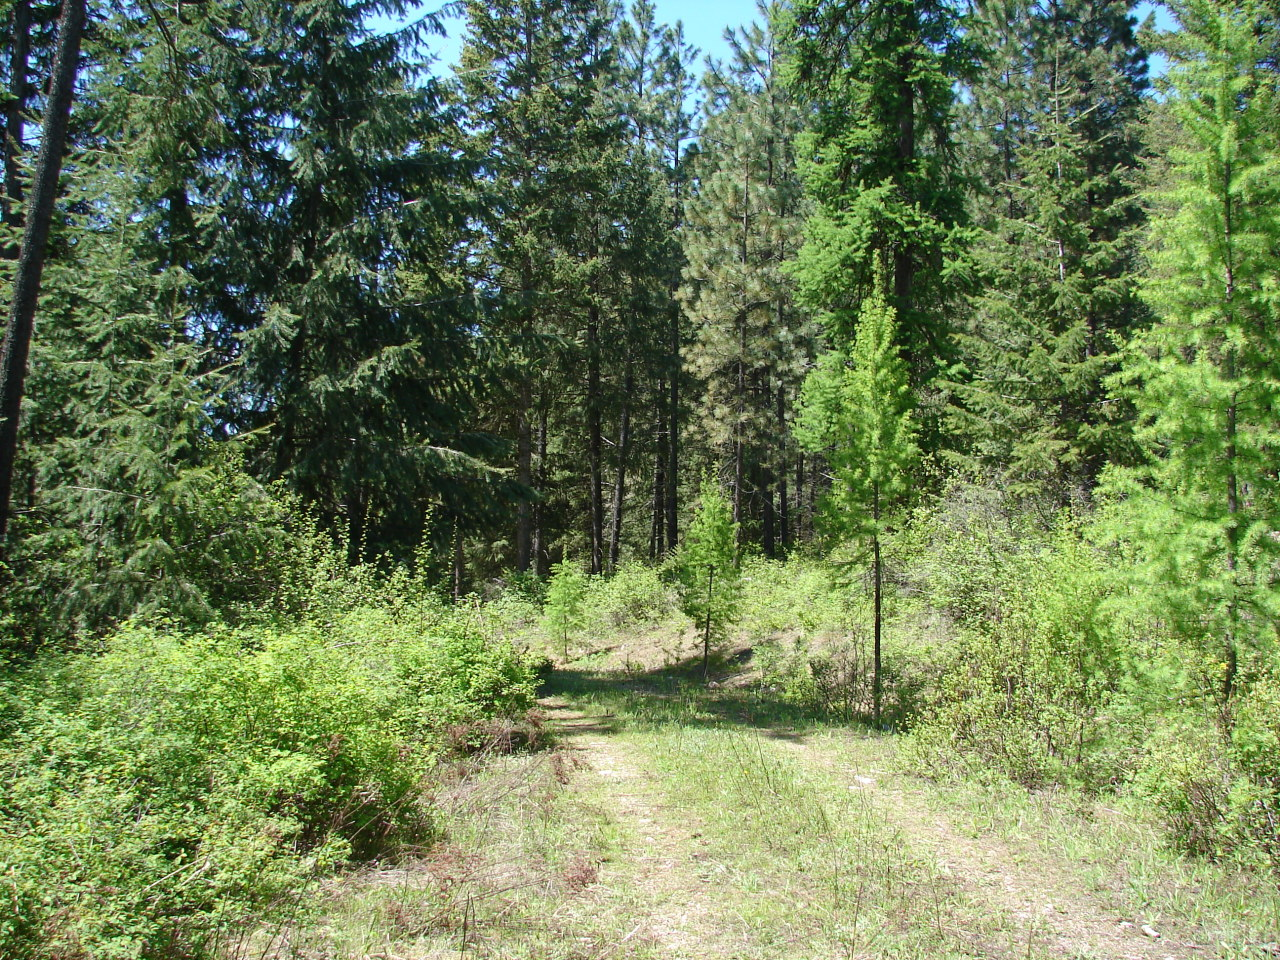 2501 HIGHLINE RD, CHEWELAH, Washington 99109, ,Lots And Land,For Sale,2501 HIGHLINE RD,38929